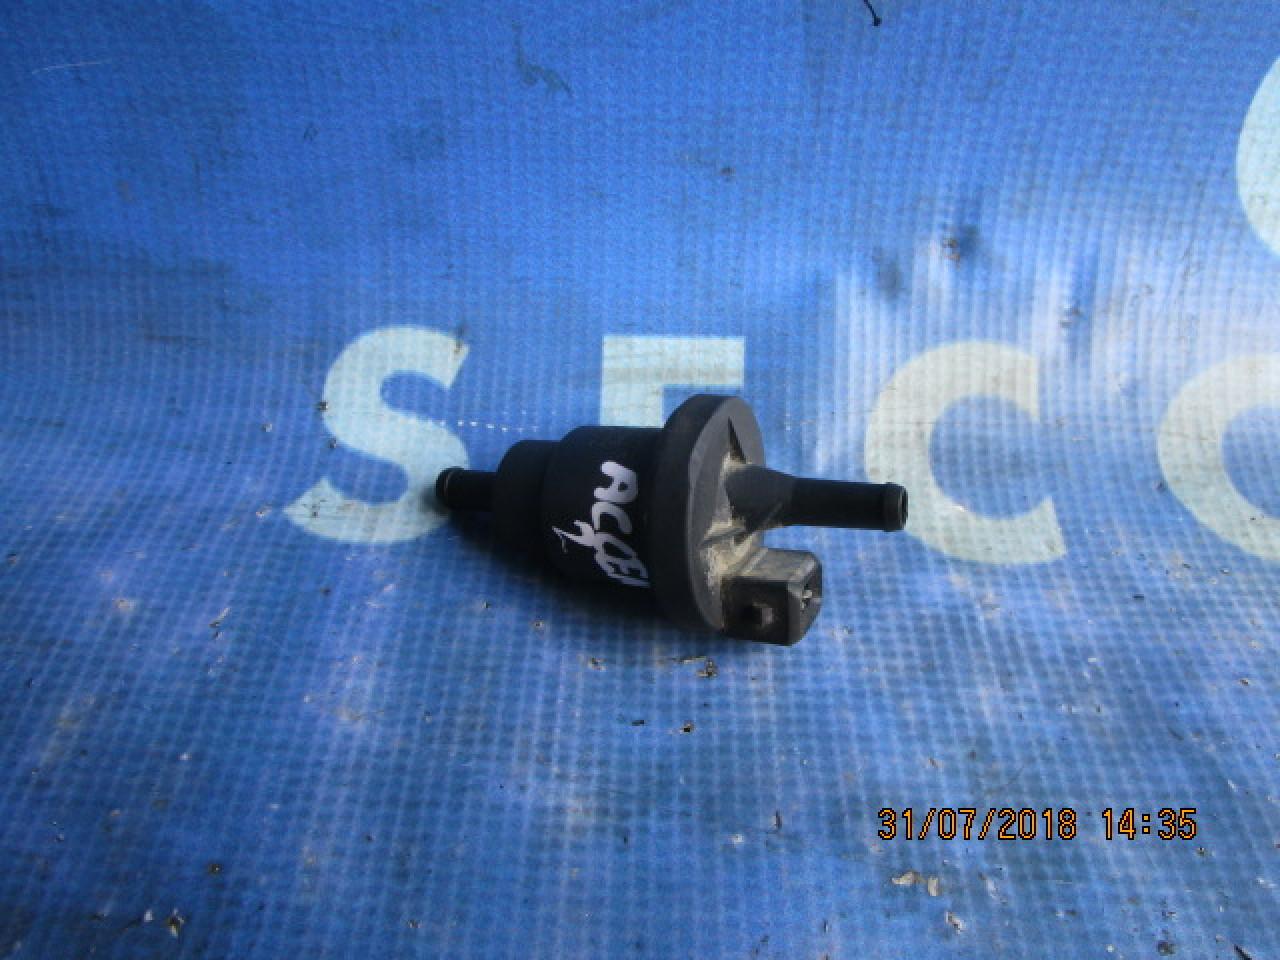 Supapa presiune combustibil Hyundai Accent 1.3 12v